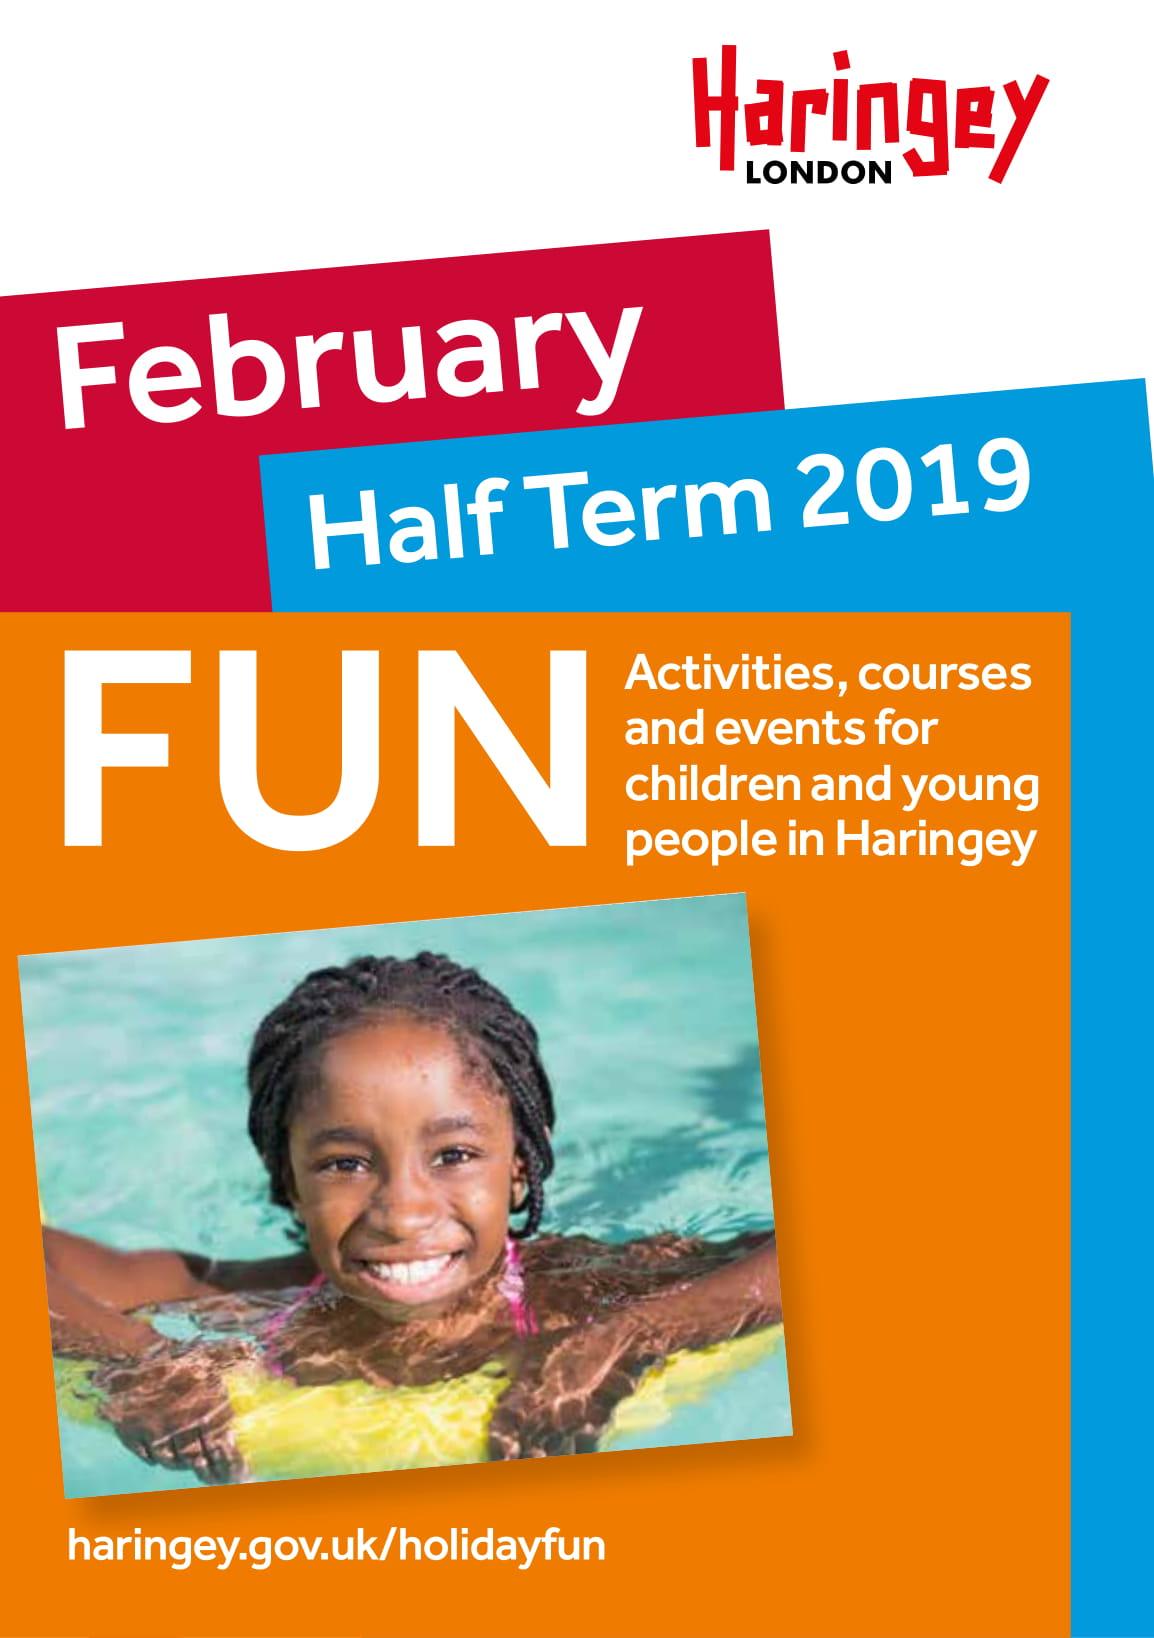 february_half_term_fun_2019-1.jpg